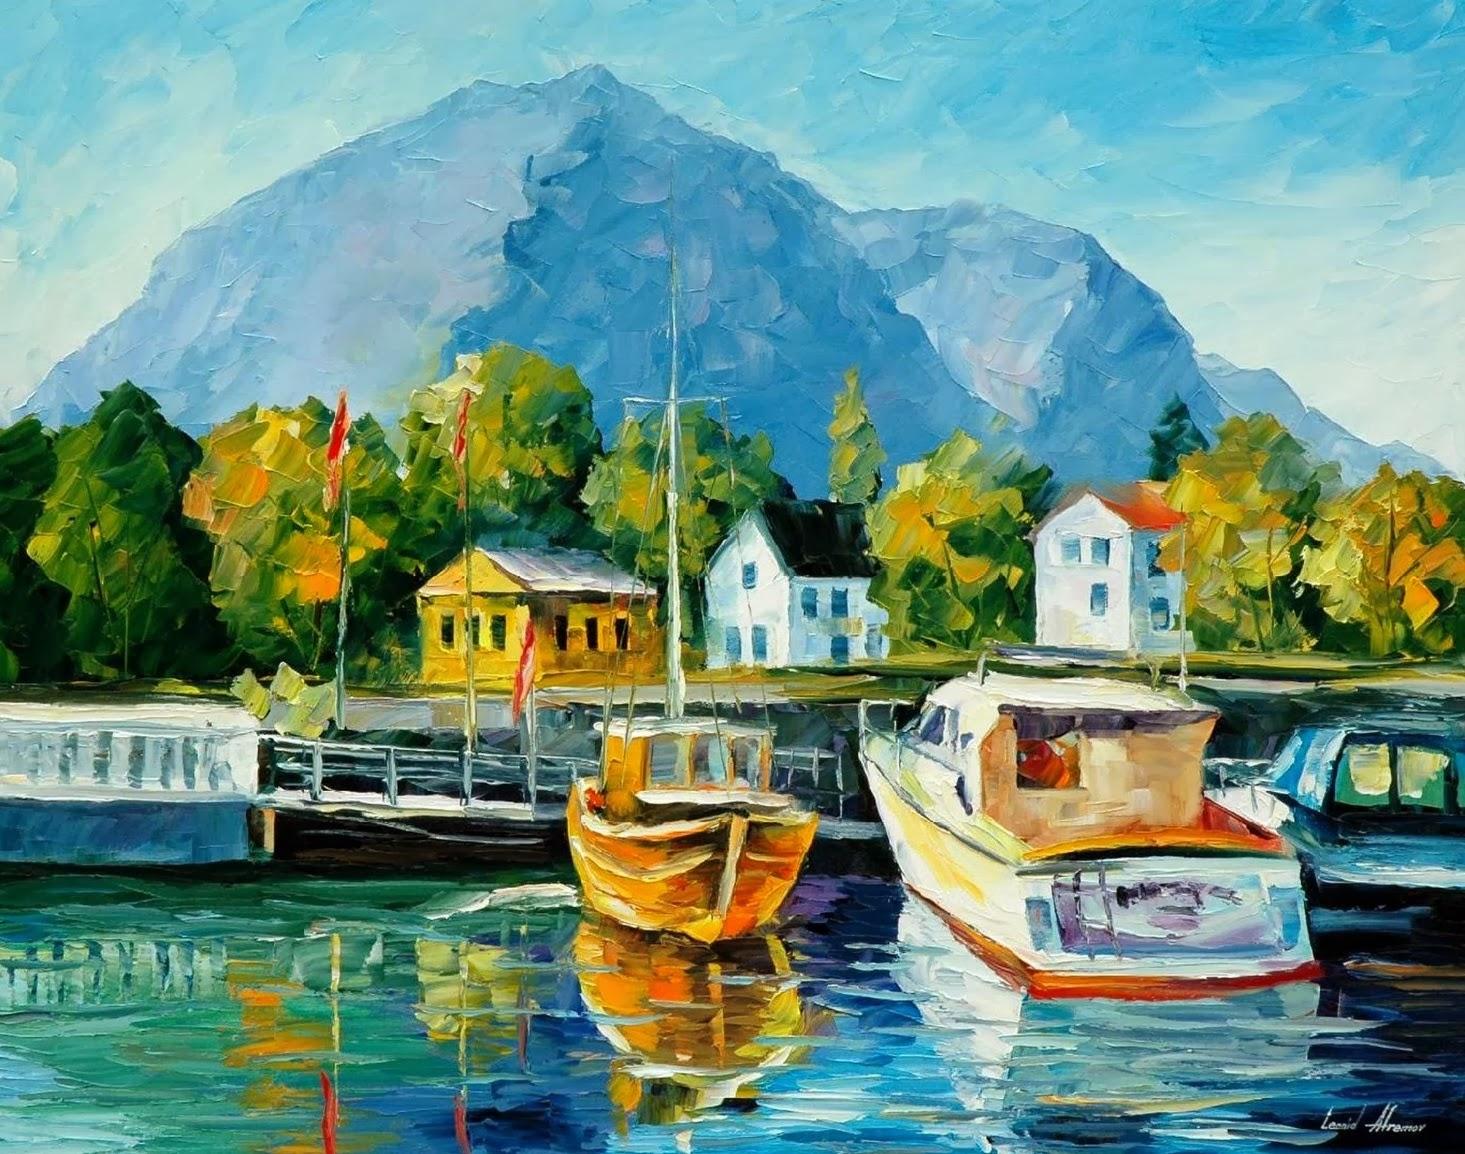 paisajes-marinos-pintados-al-oleo